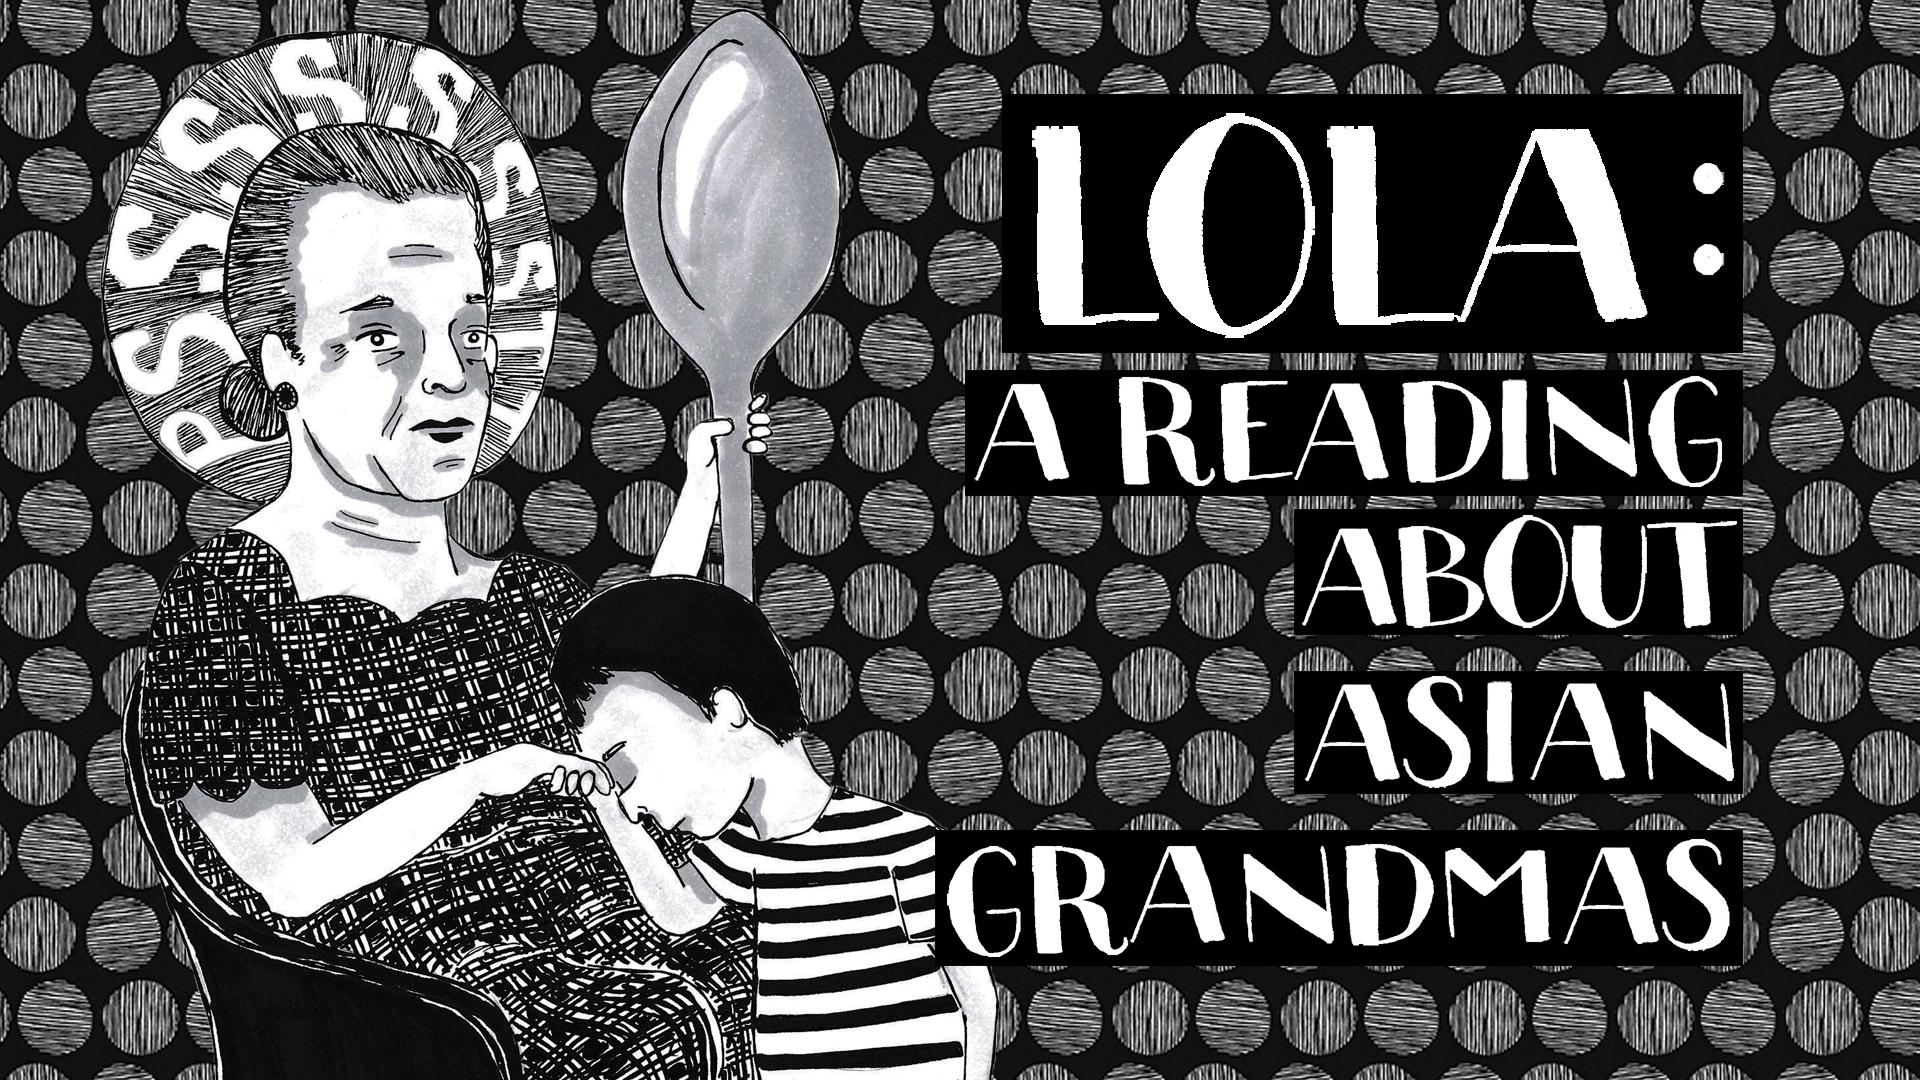 Lola: A Reading About Asian Grandmas